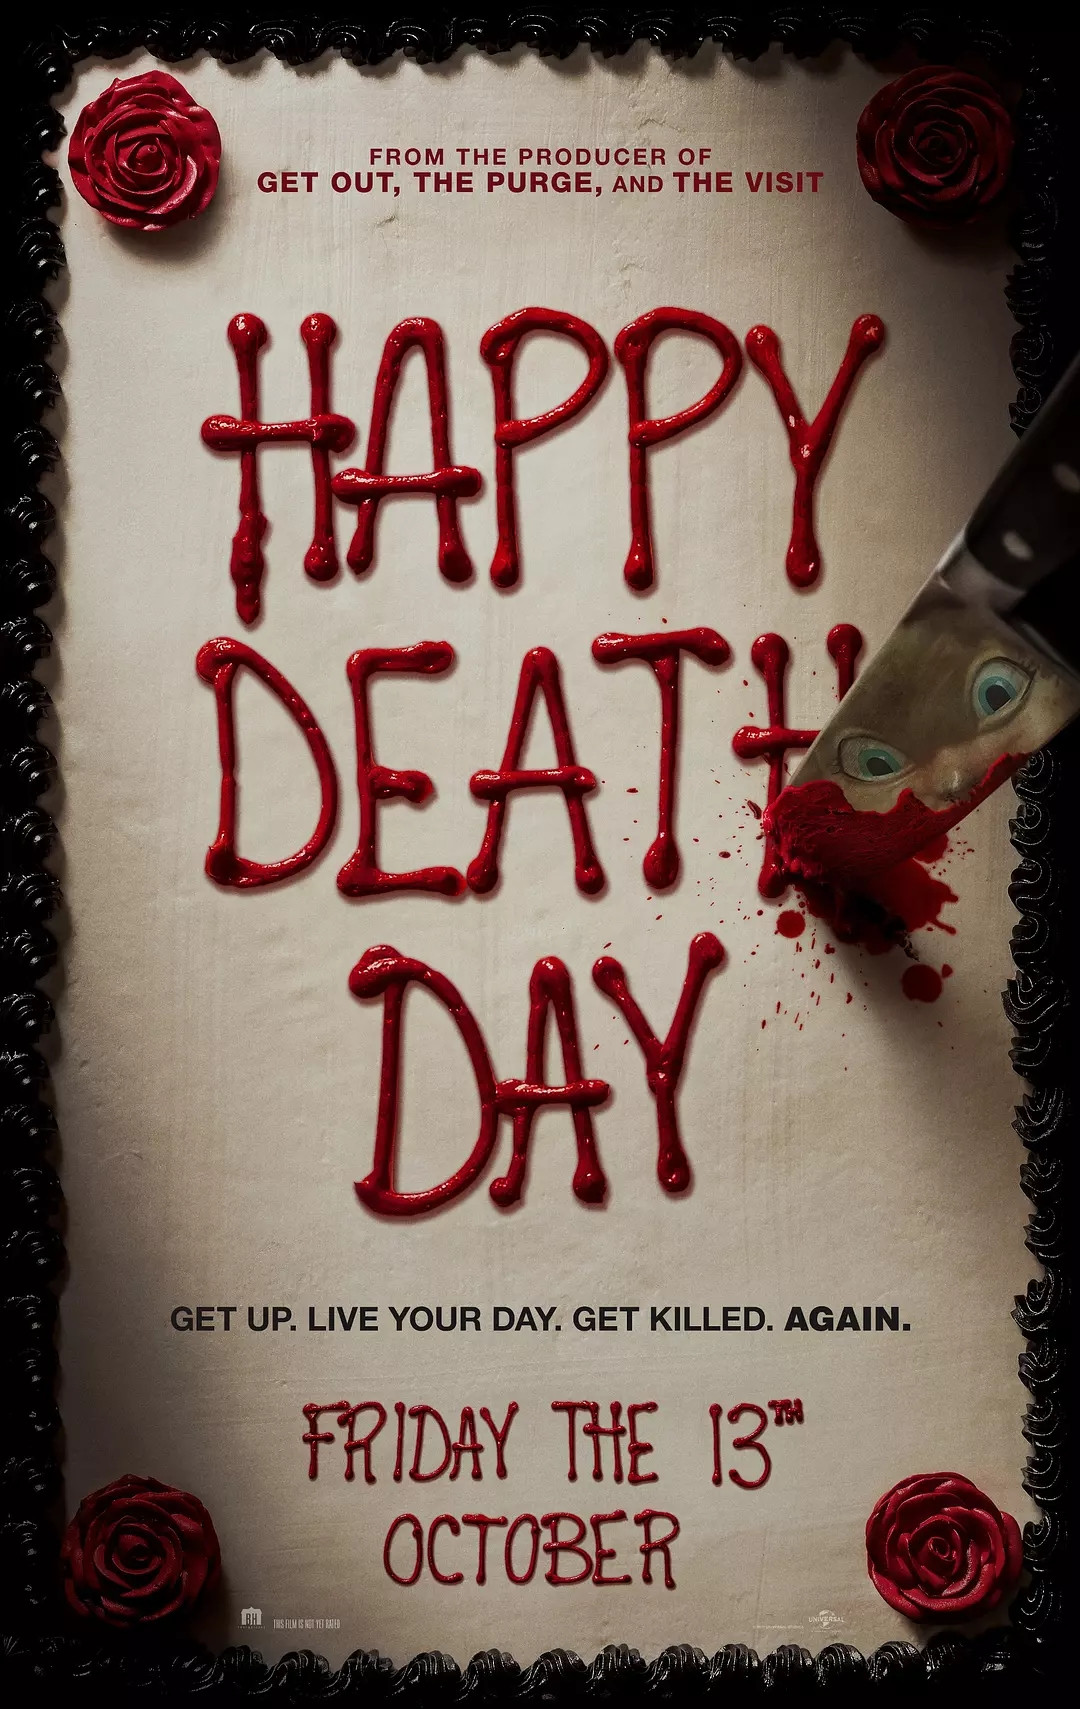 忌日快乐 4K蓝光原盘下载+高清MKV版/ 吓到半死 / 死亡无限LOOP(港) / Again / Half to Death 2017 Happy Death Day33.1G